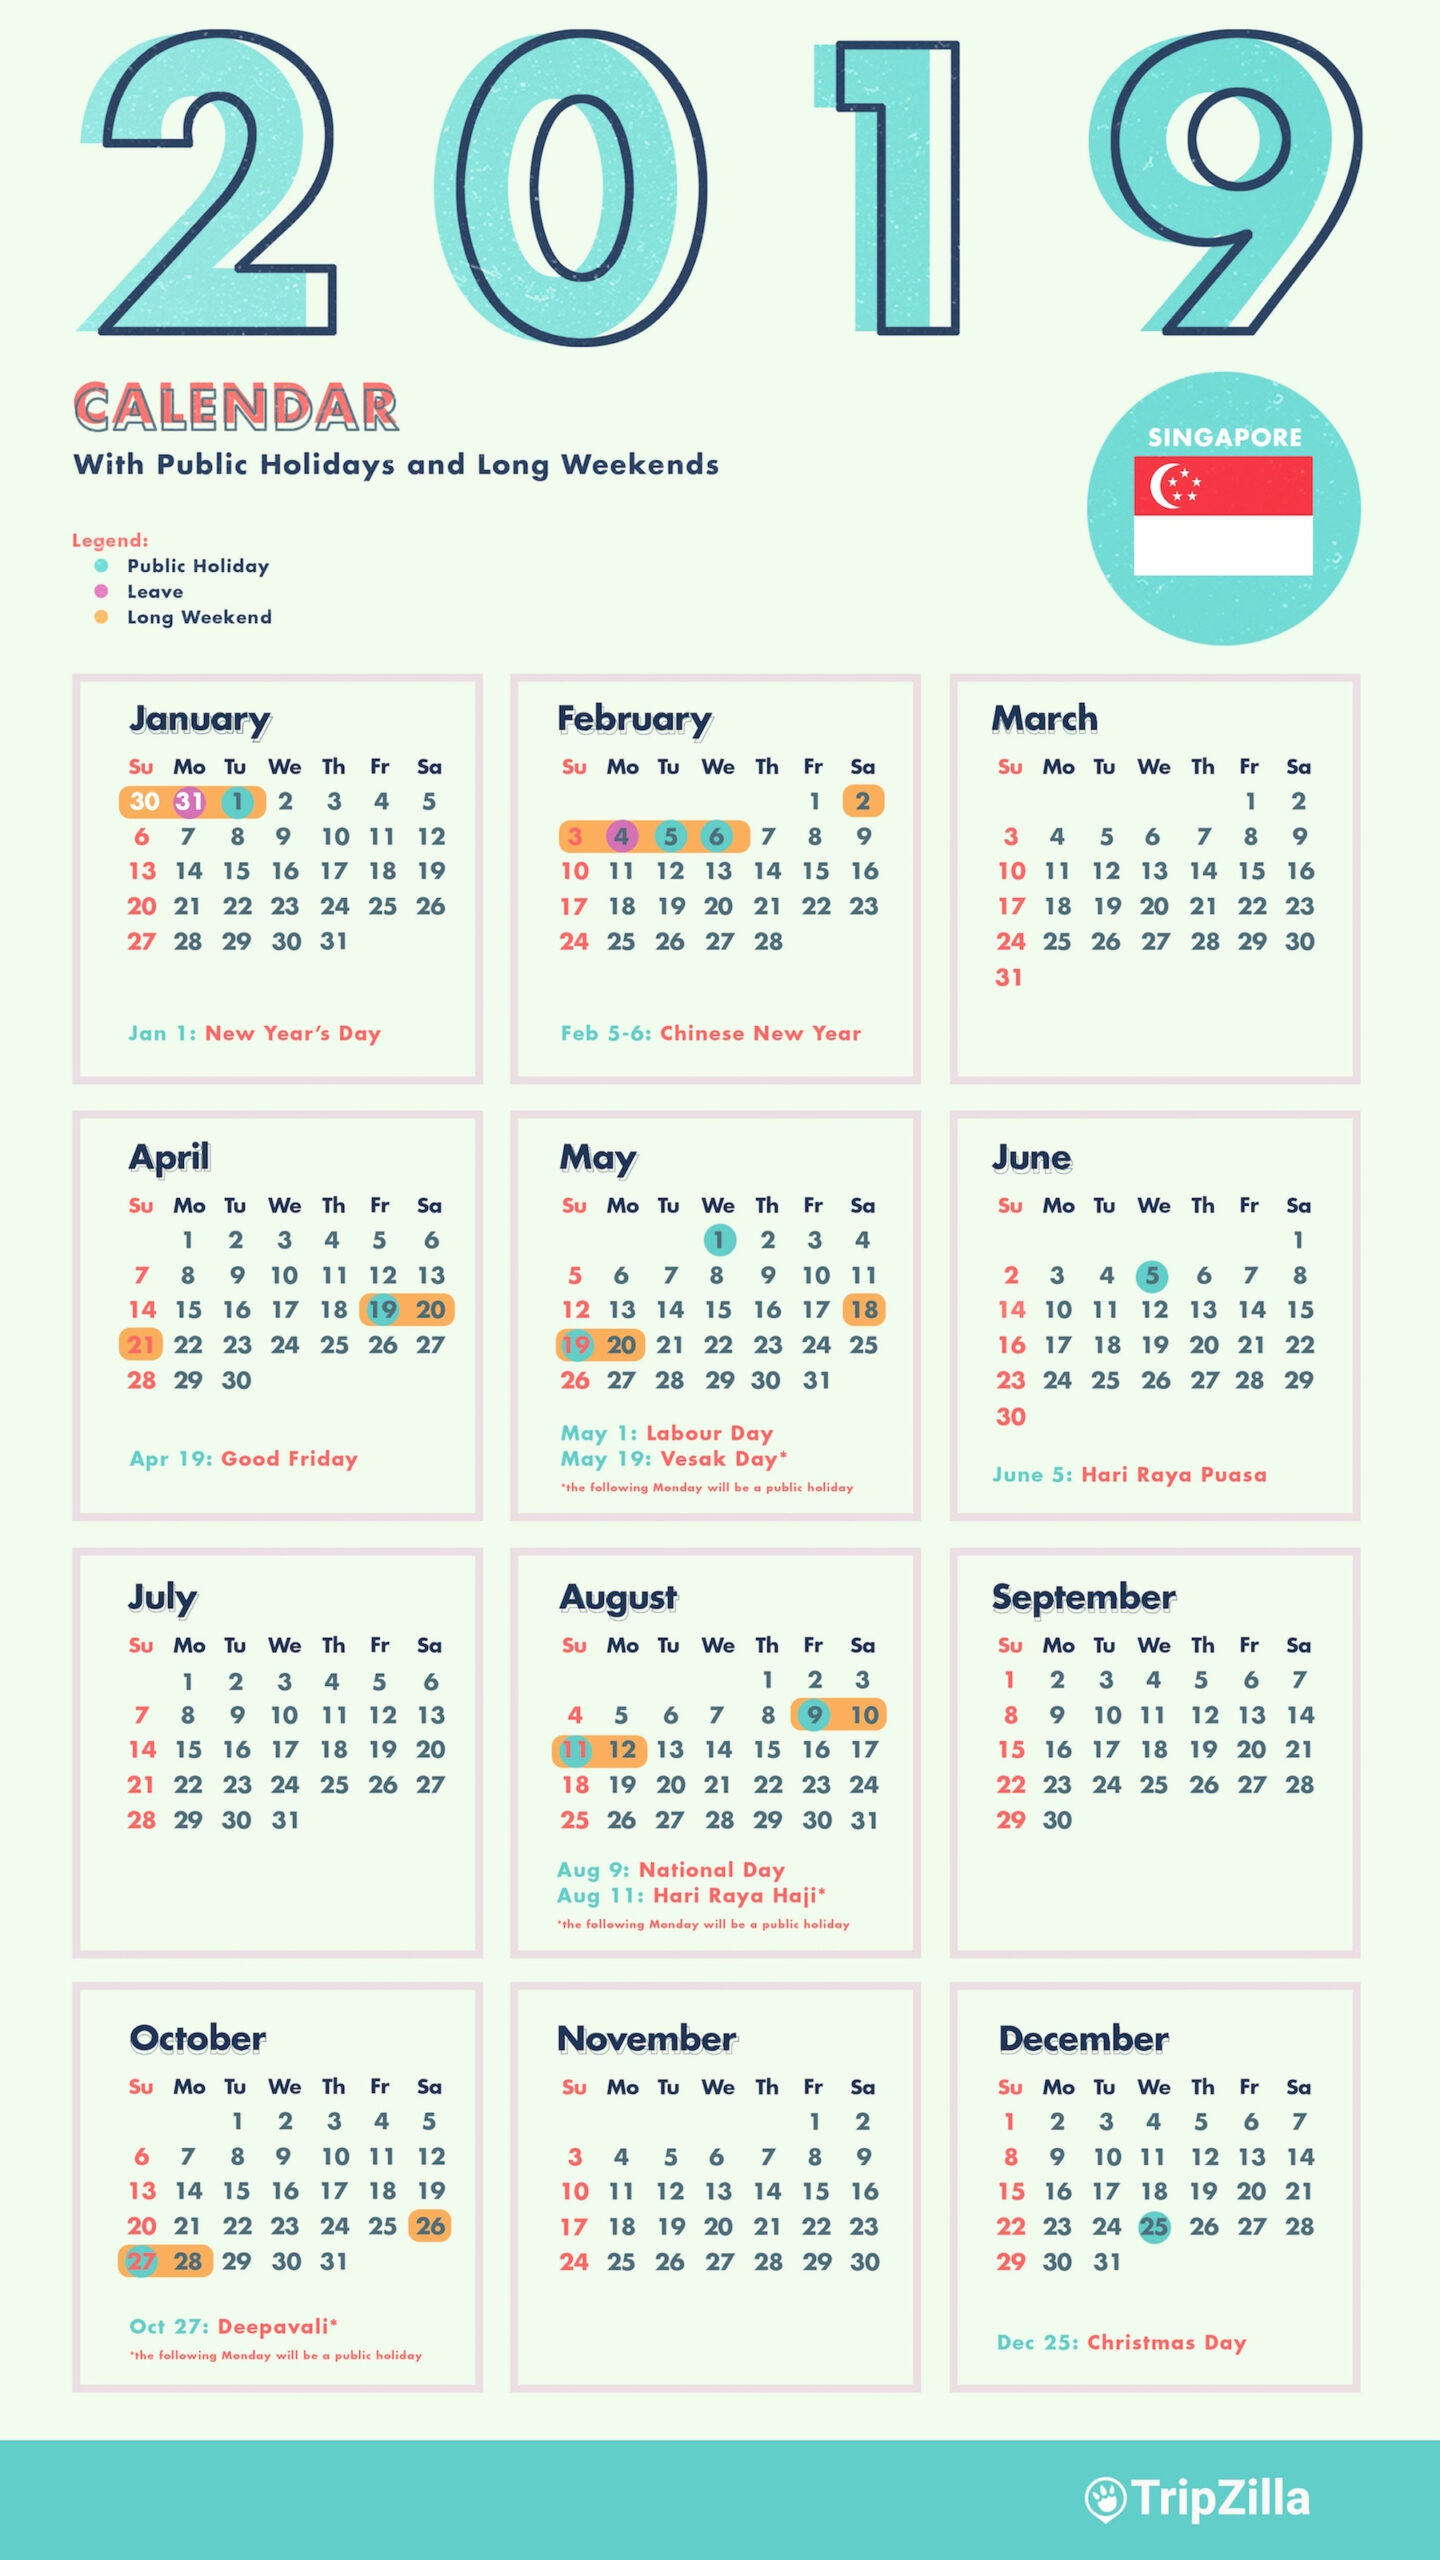 Depo Schedule 2021